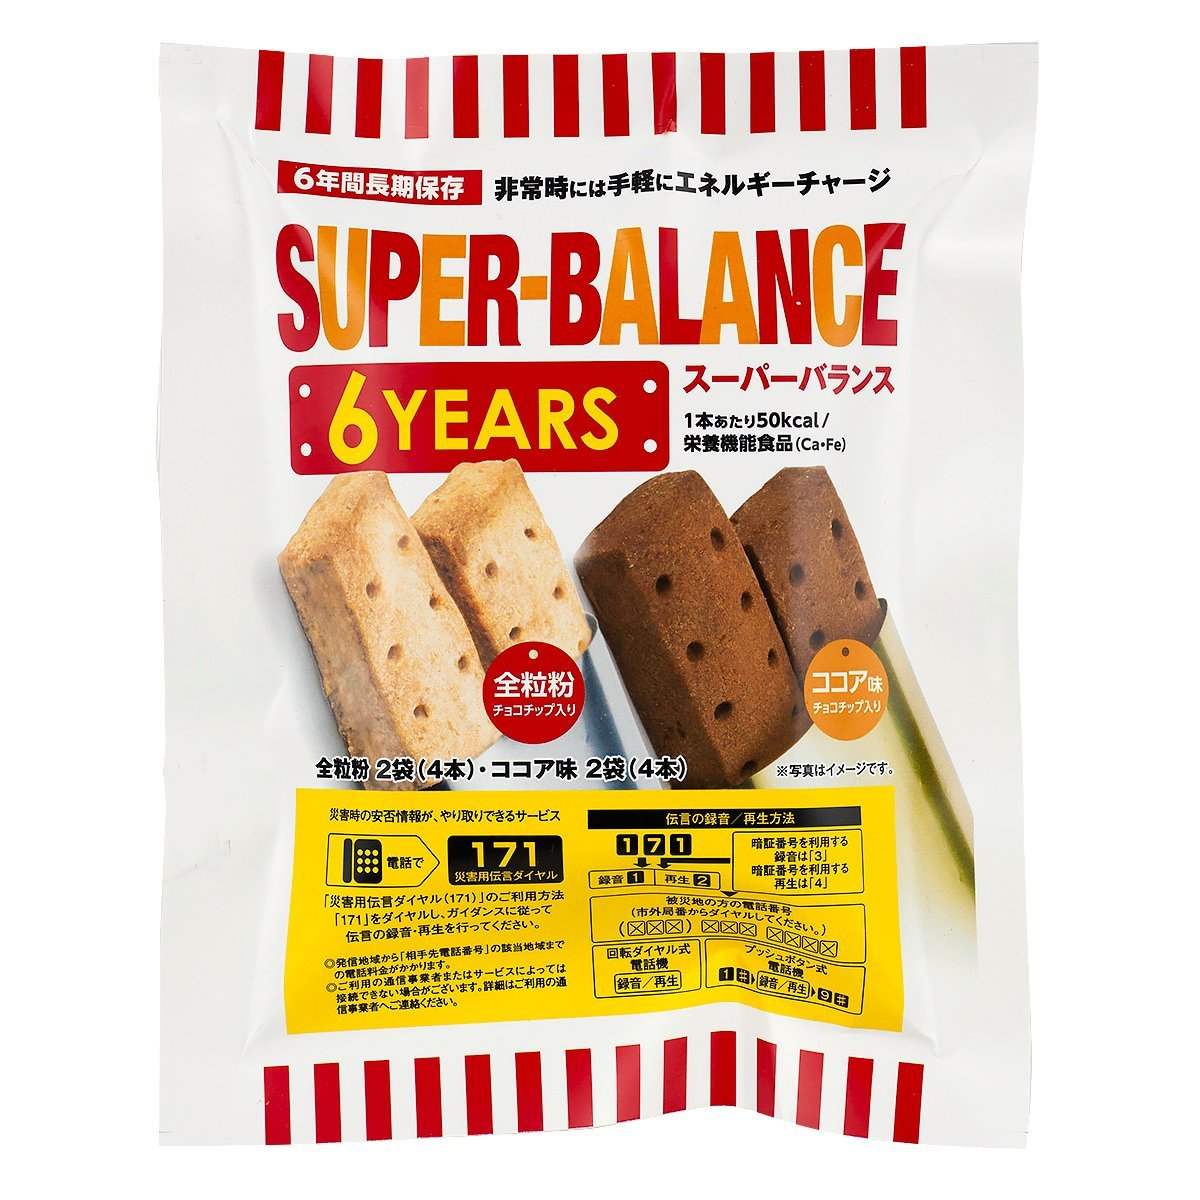 SUPER-BALANCE(20袋入)